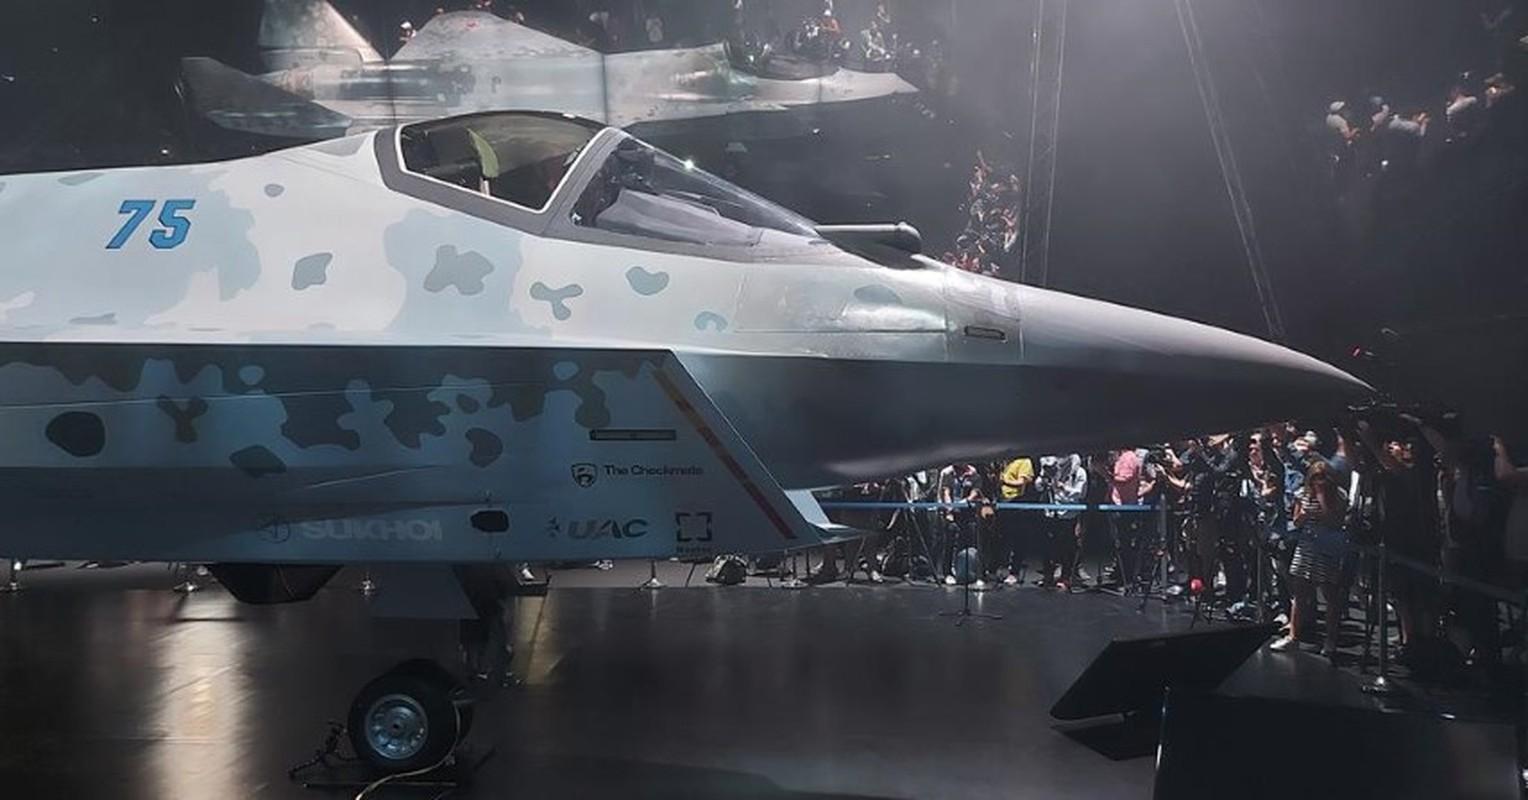 Tiem kich Su-75: Moi ra mat 1 tuan da nhieu nguoi hoi mua-Hinh-6